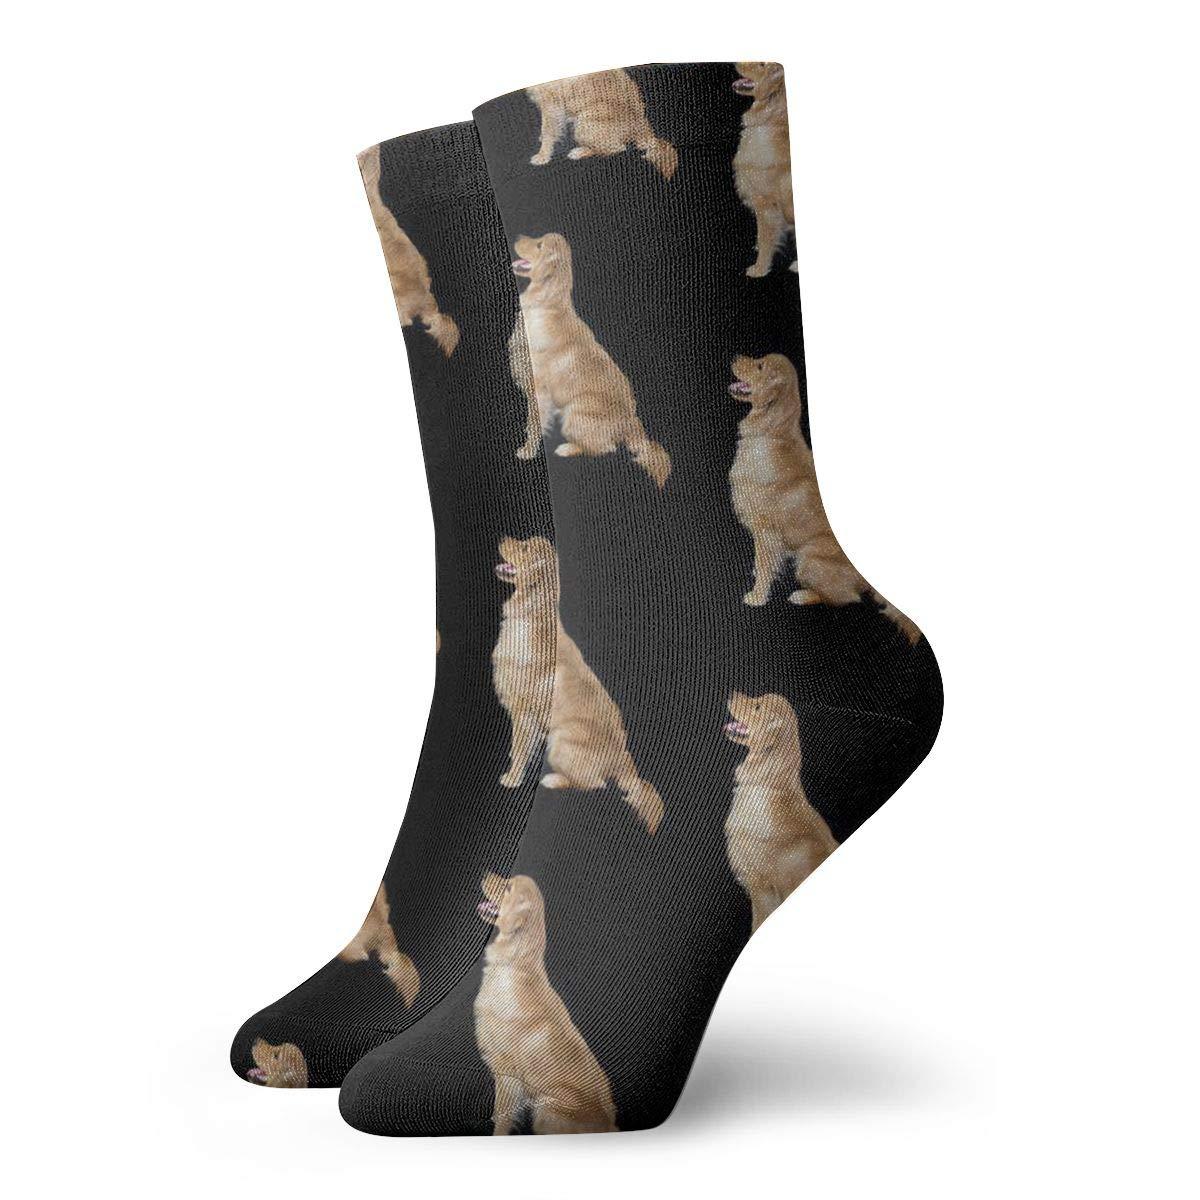 Golden Retriever Unisex Funny Casual Crew Socks Athletic Socks For Boys Girls Kids Teenagers